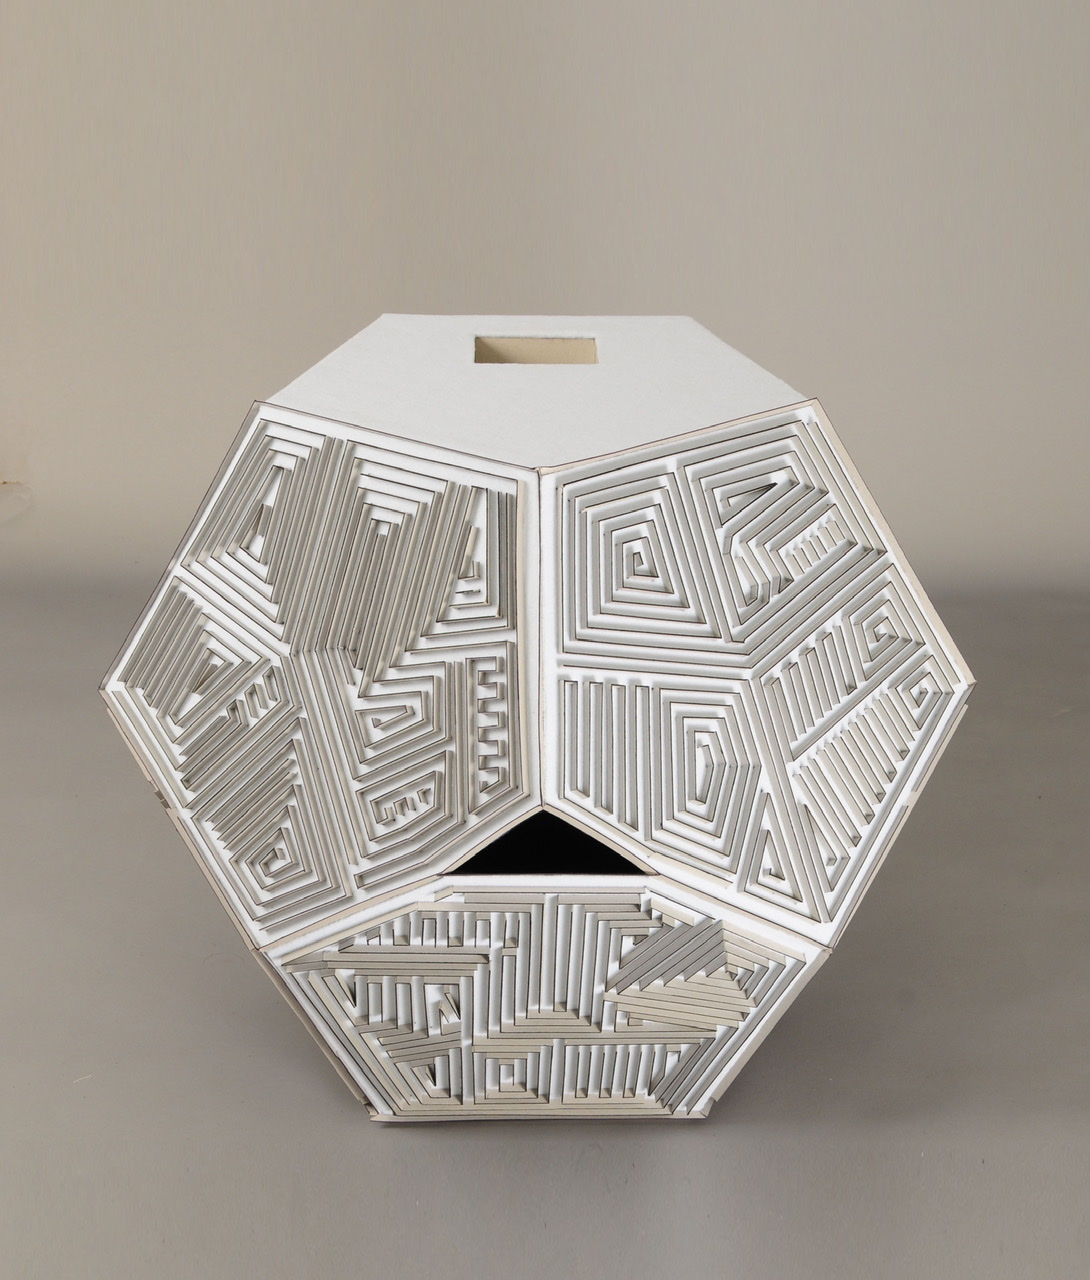 CT-004 cardboard,felt,camera obscura 80x80x80cm